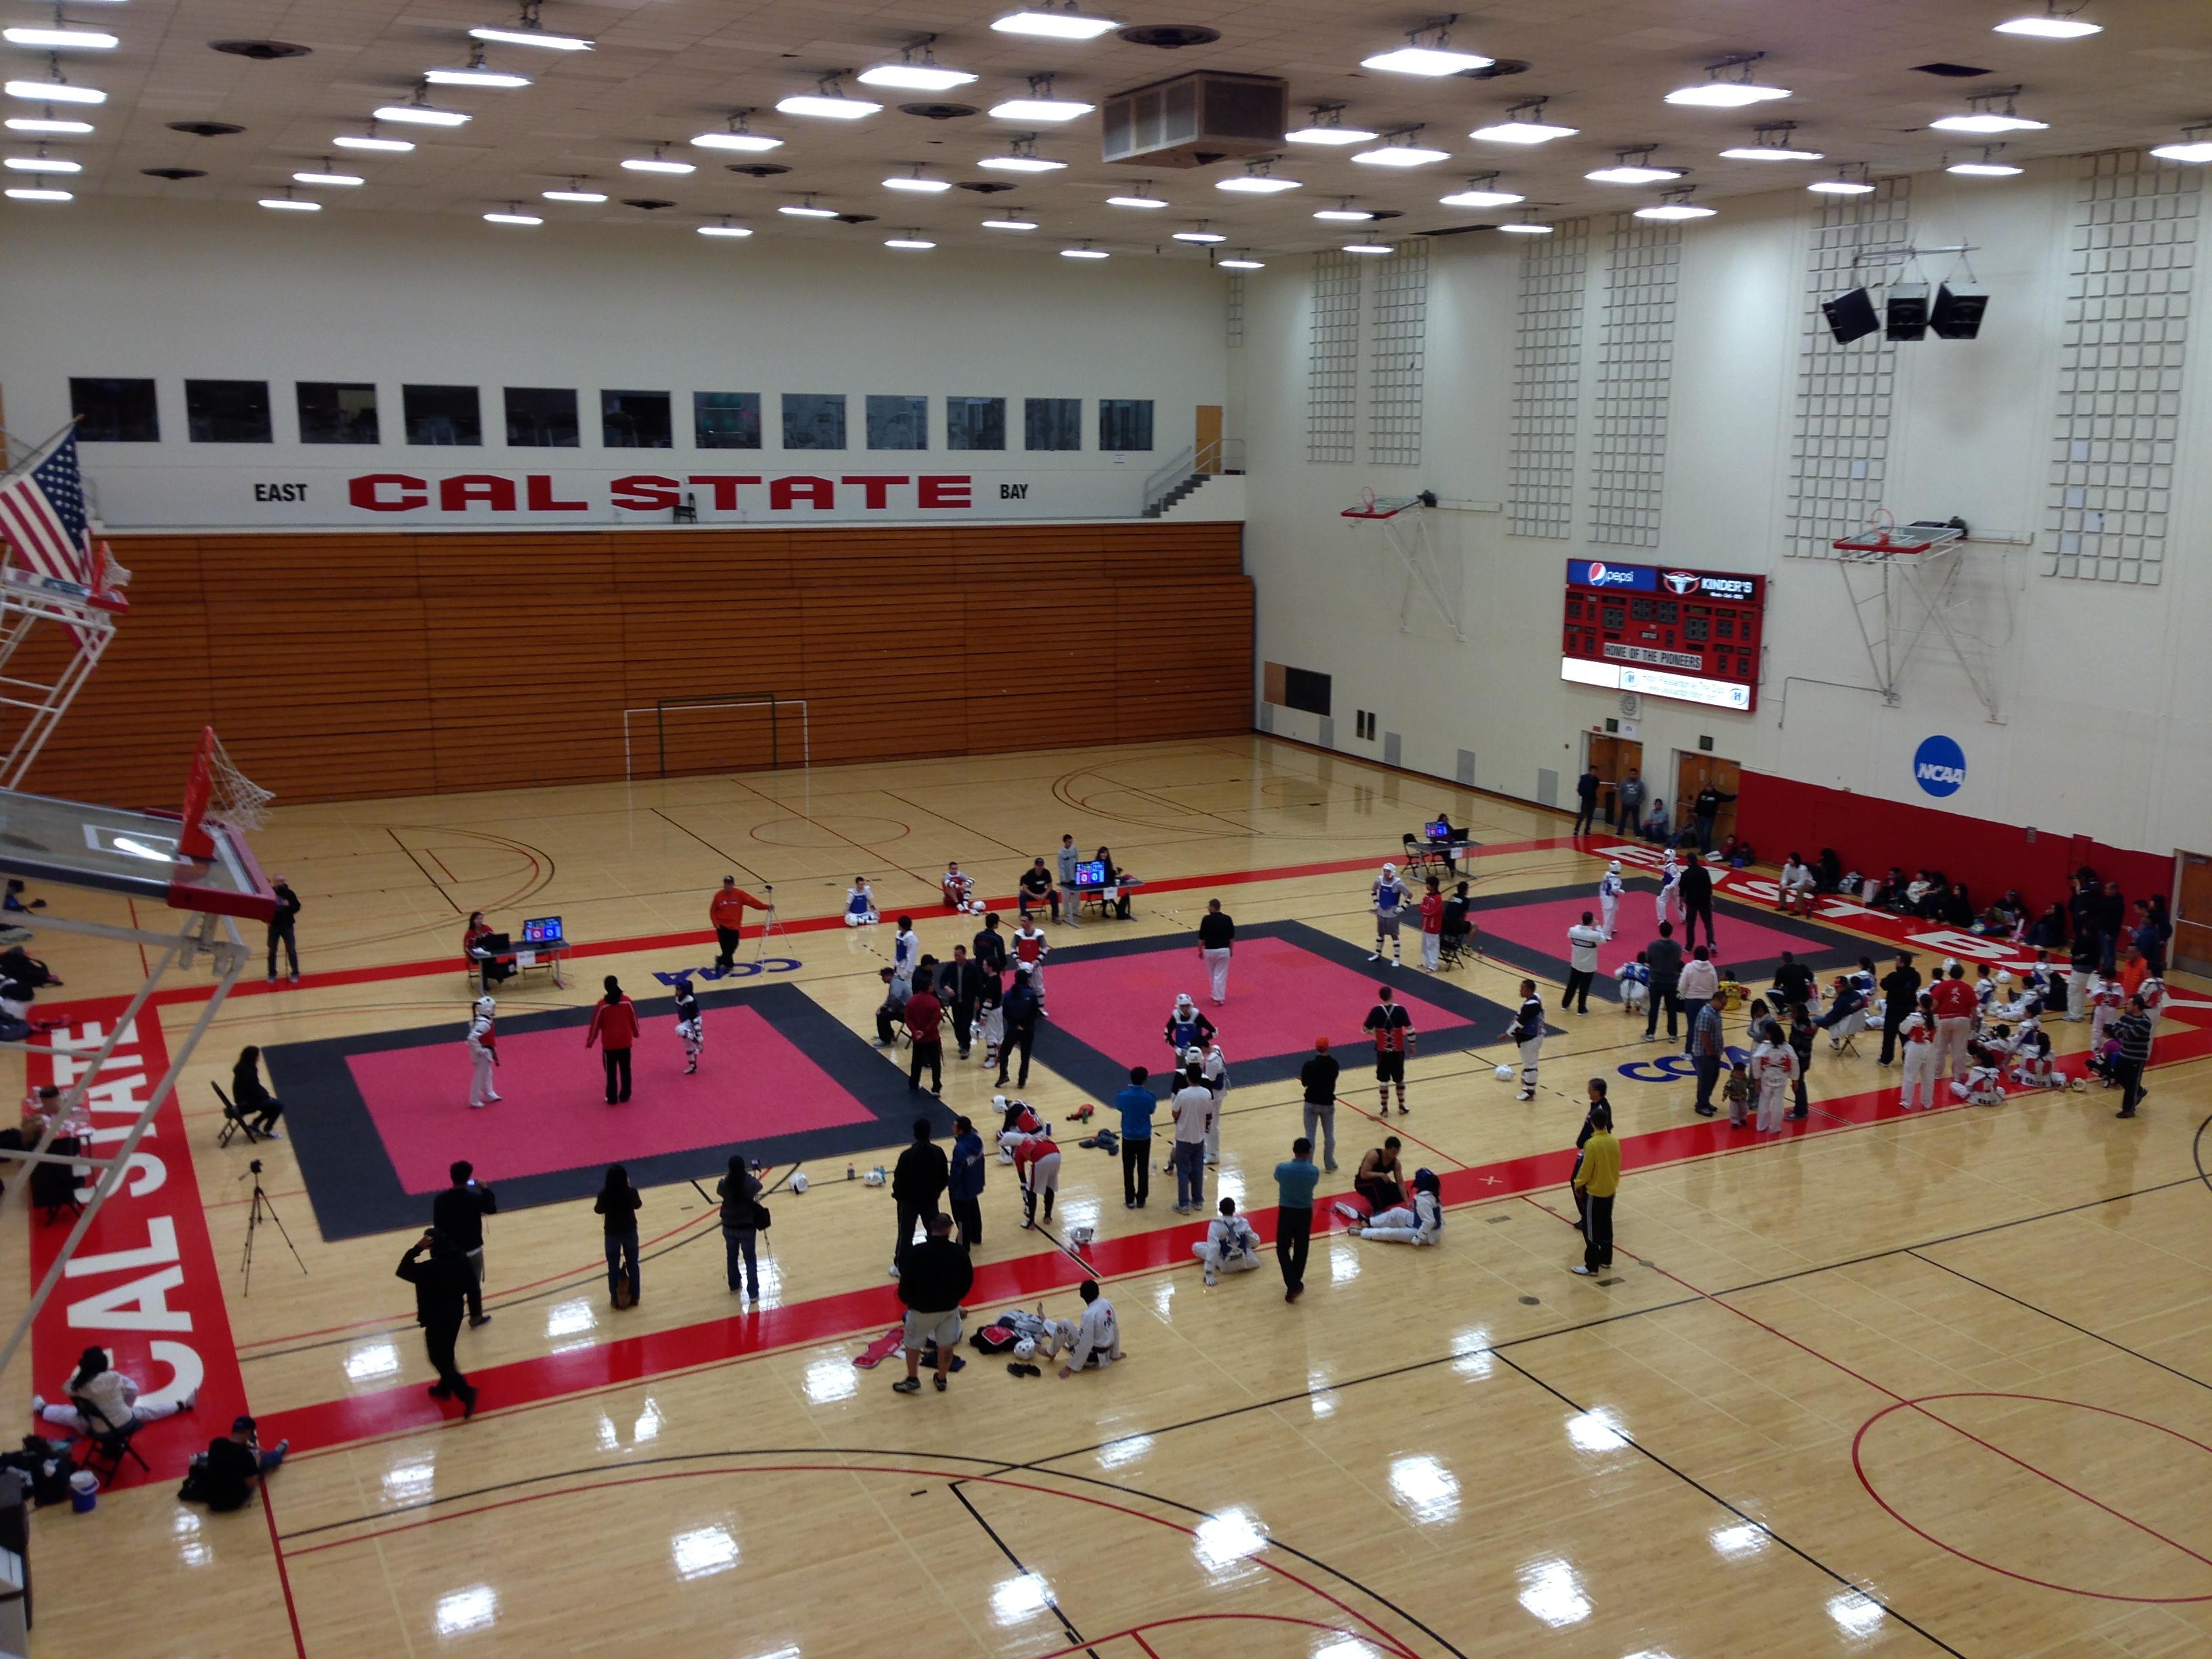 Csu east bay taekwondo for Cost to build a basketball gym